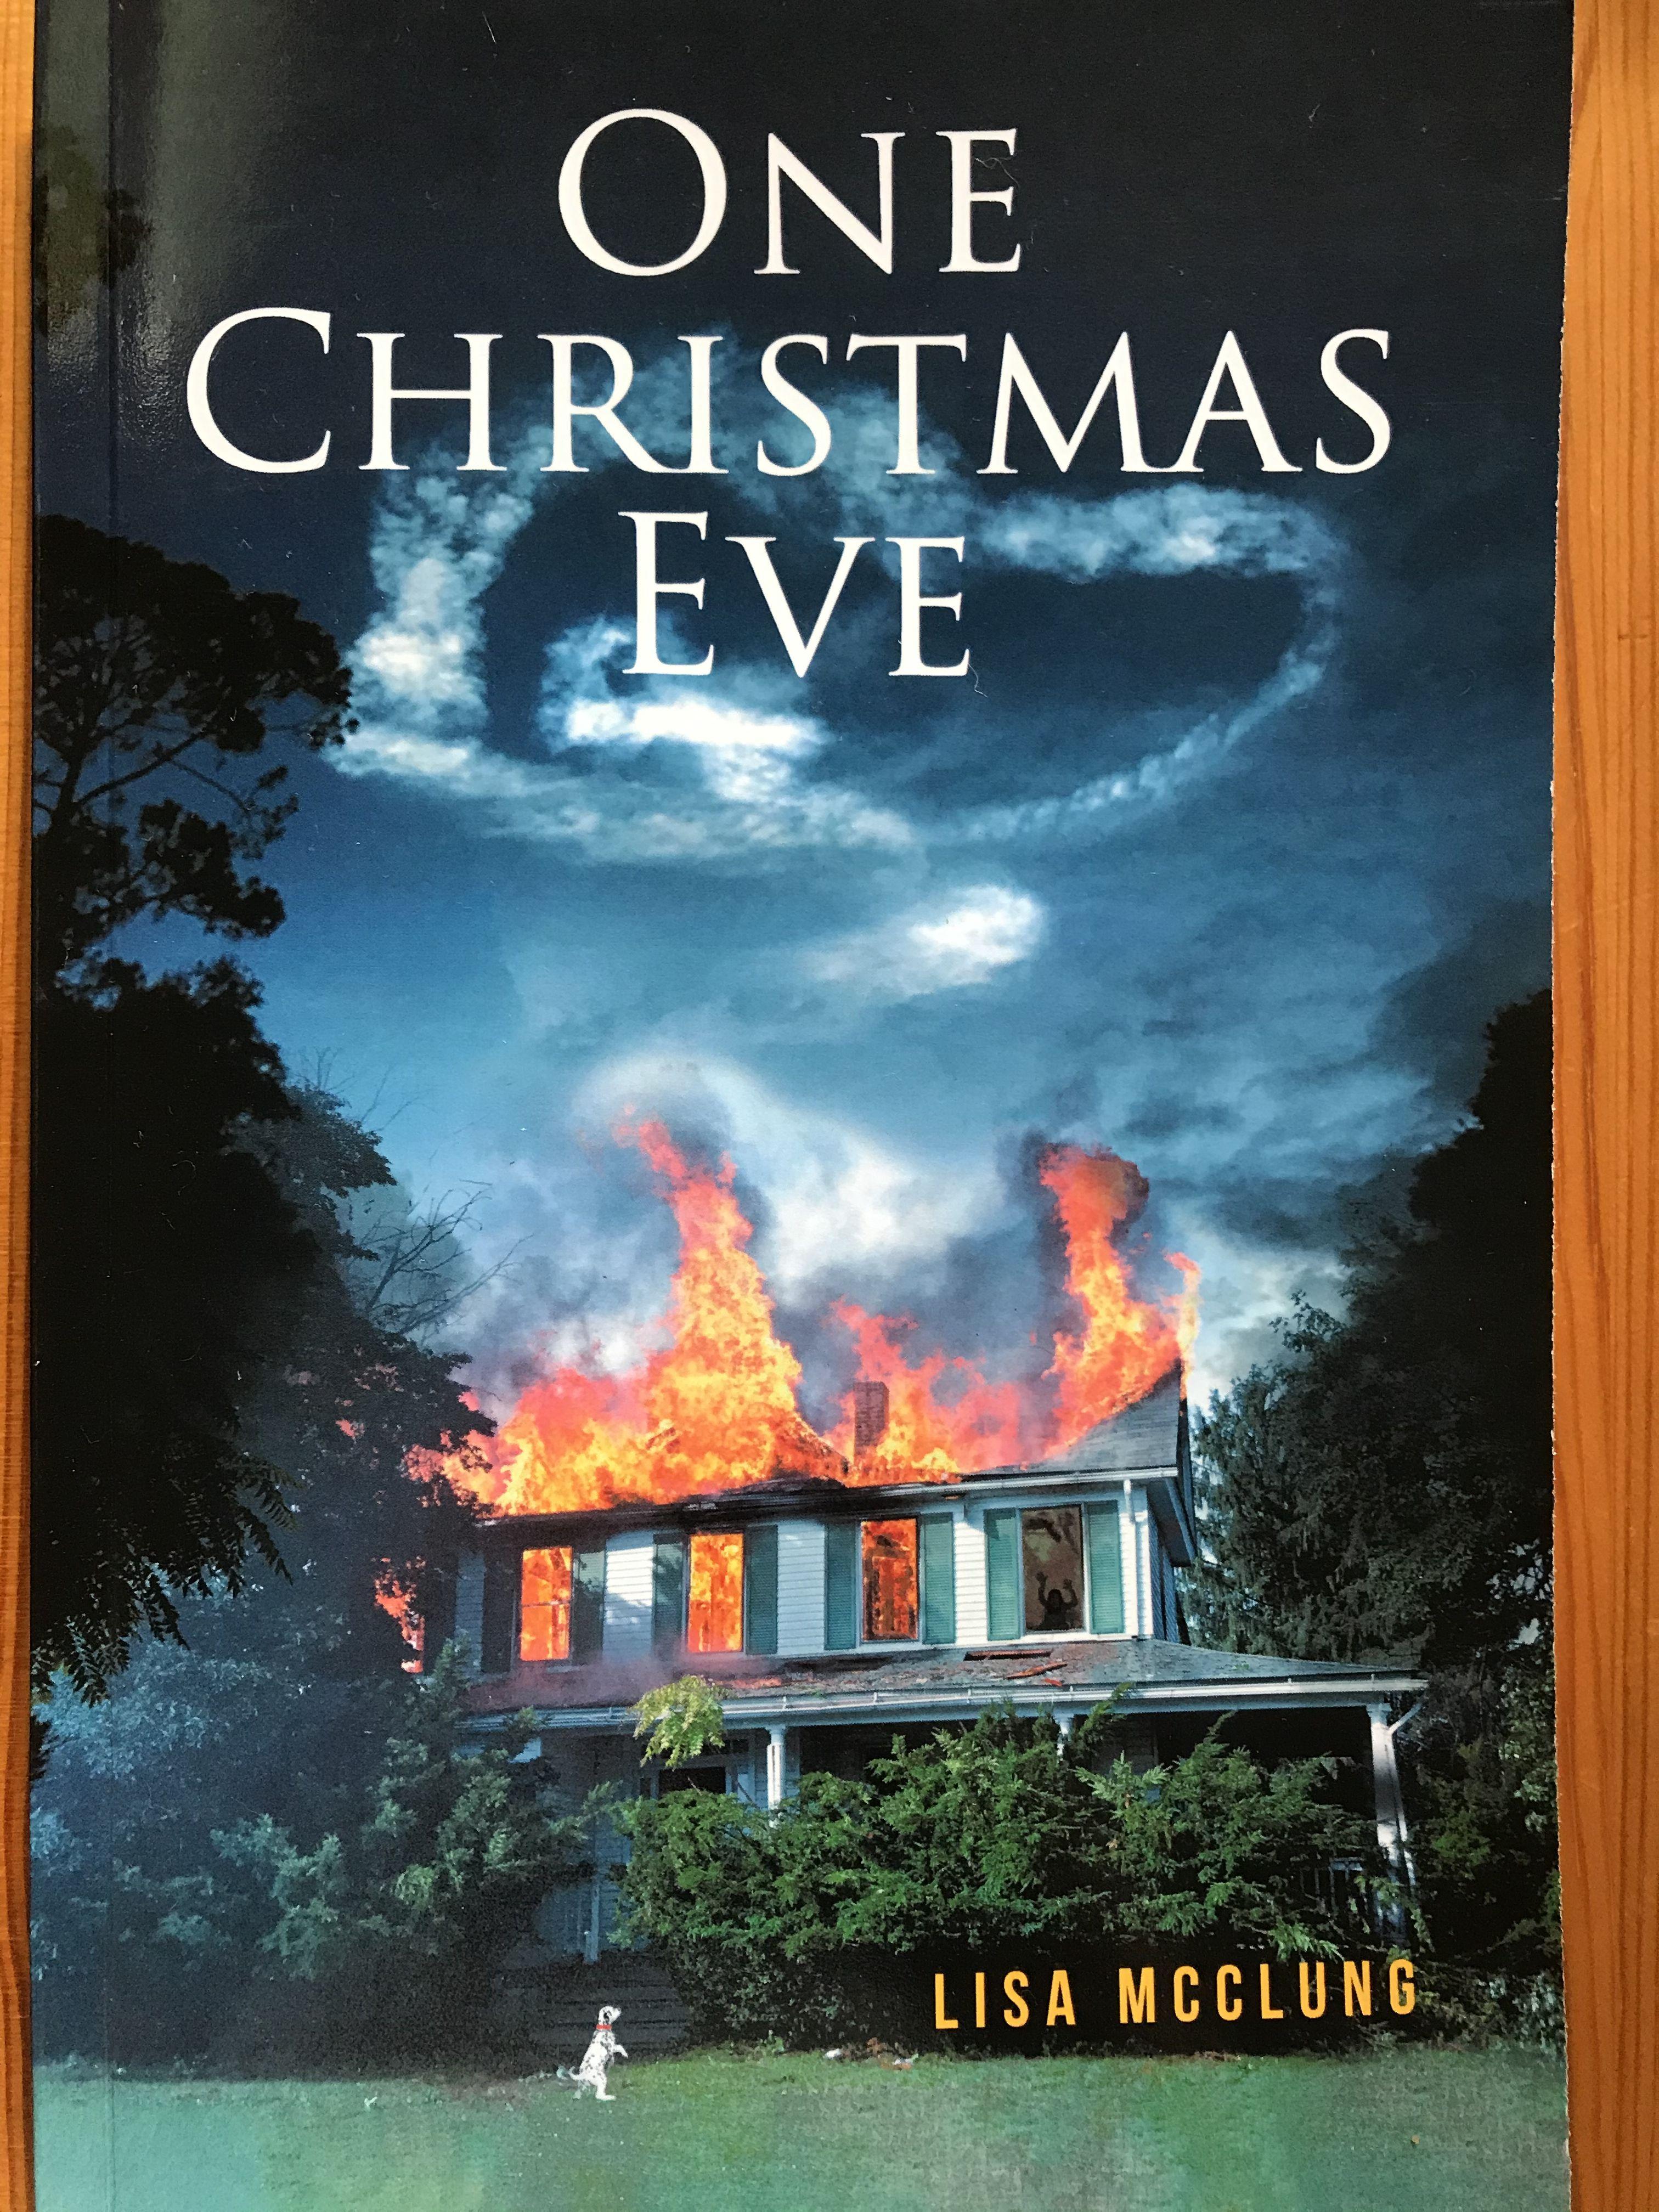 Barnes And.Noble Christmas Eve 2020 One Christmas Eve in 2020   Christmas eve, First christmas, Barnes